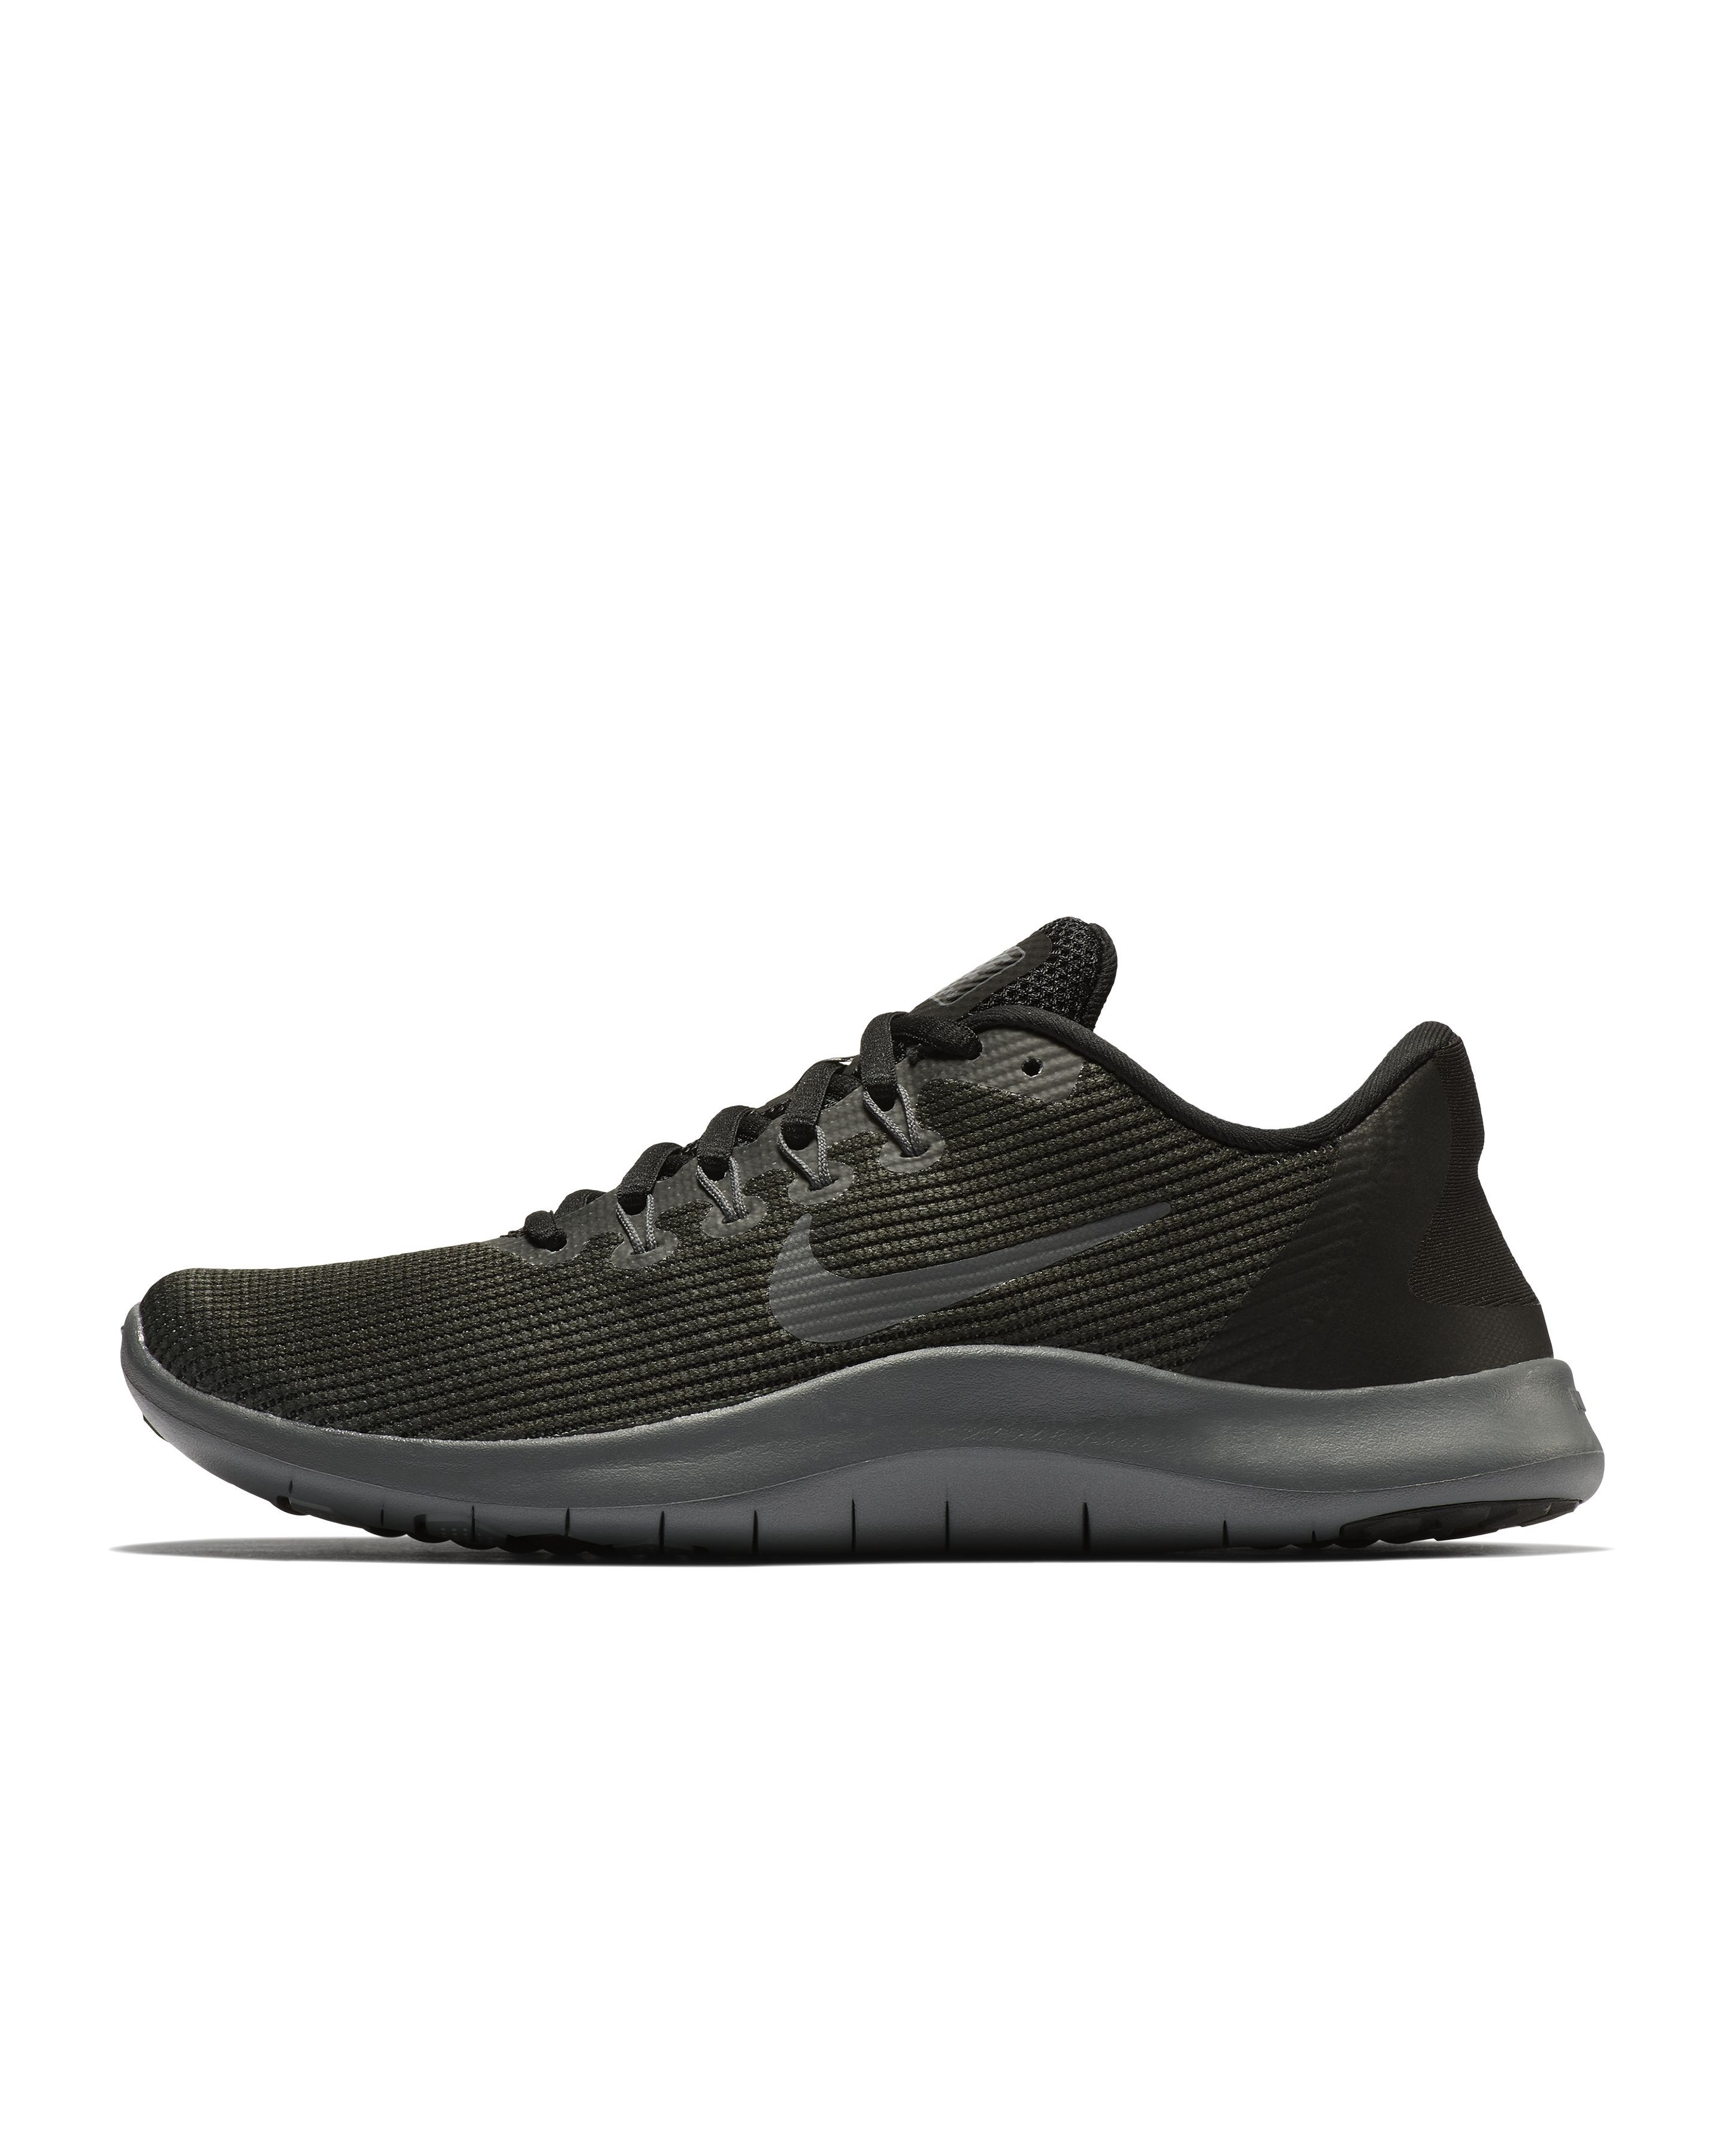 6347393ef246 Nike Shoe Sale — Deal on Nike Running Shoes April 2019